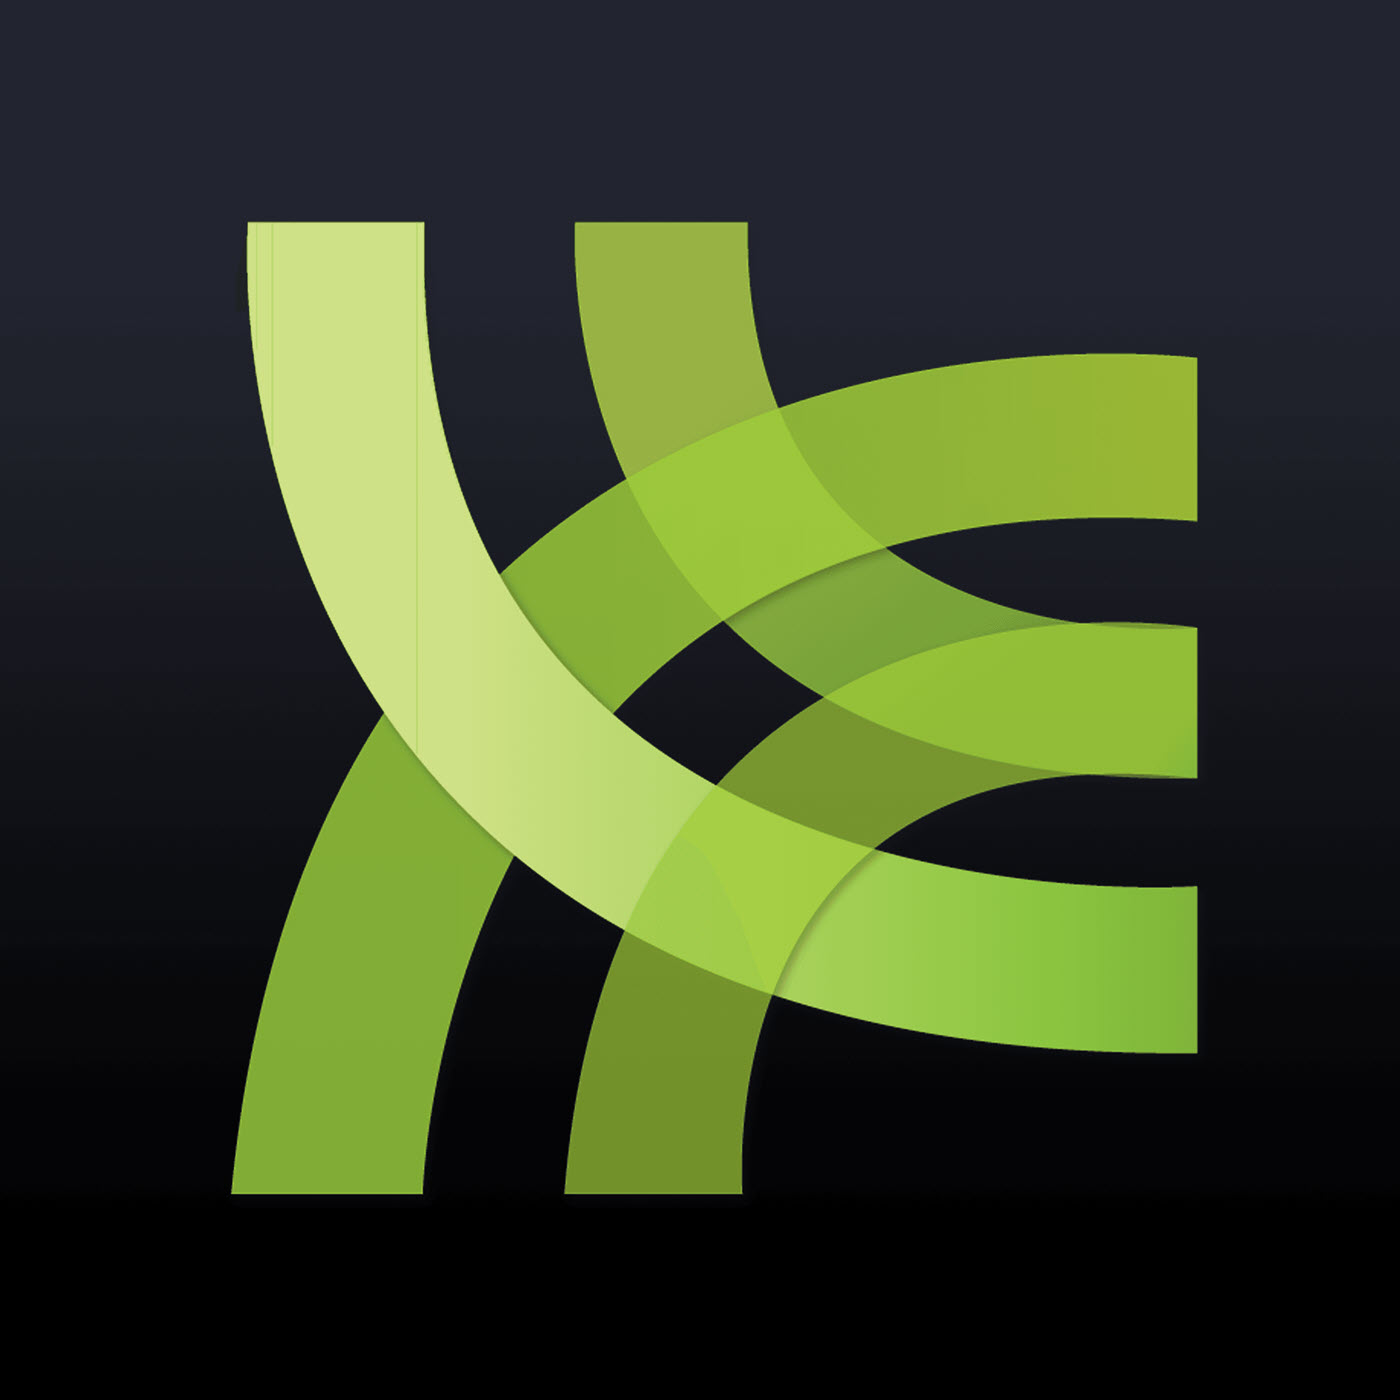 Twitter image logo